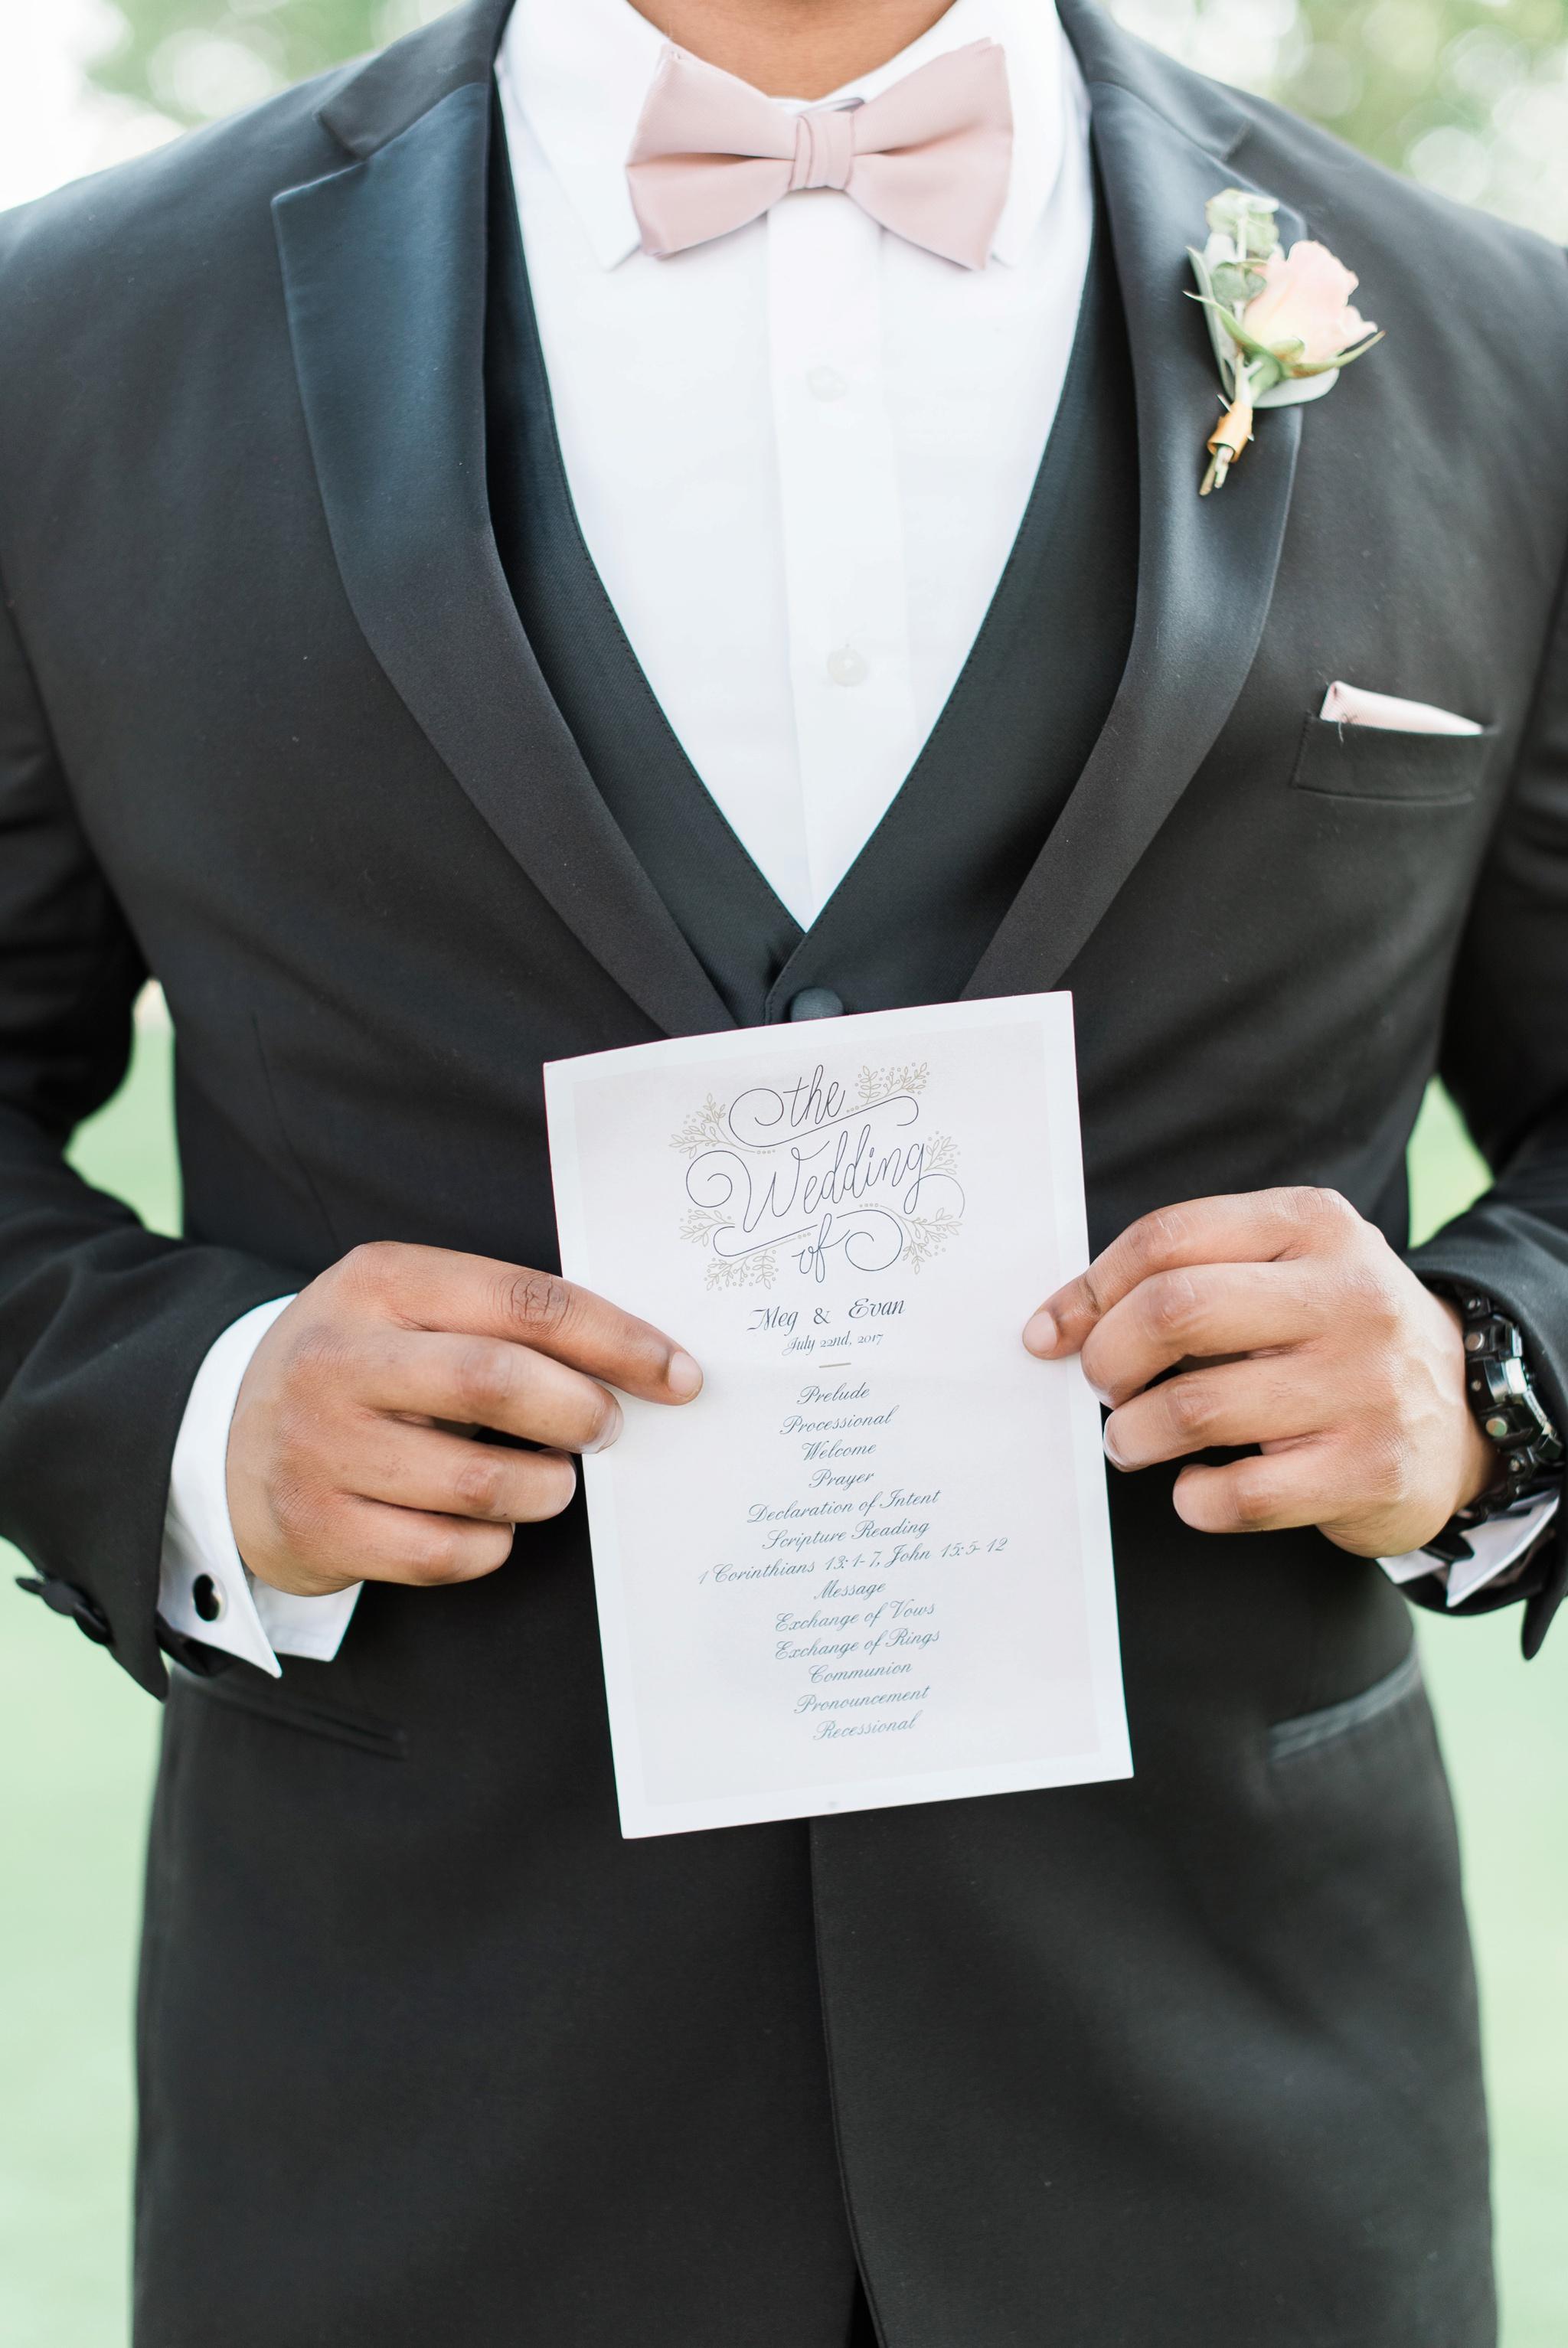 worthington-hills-country-club-wedding-columbus-ohio-meg-evan_0071.jpg